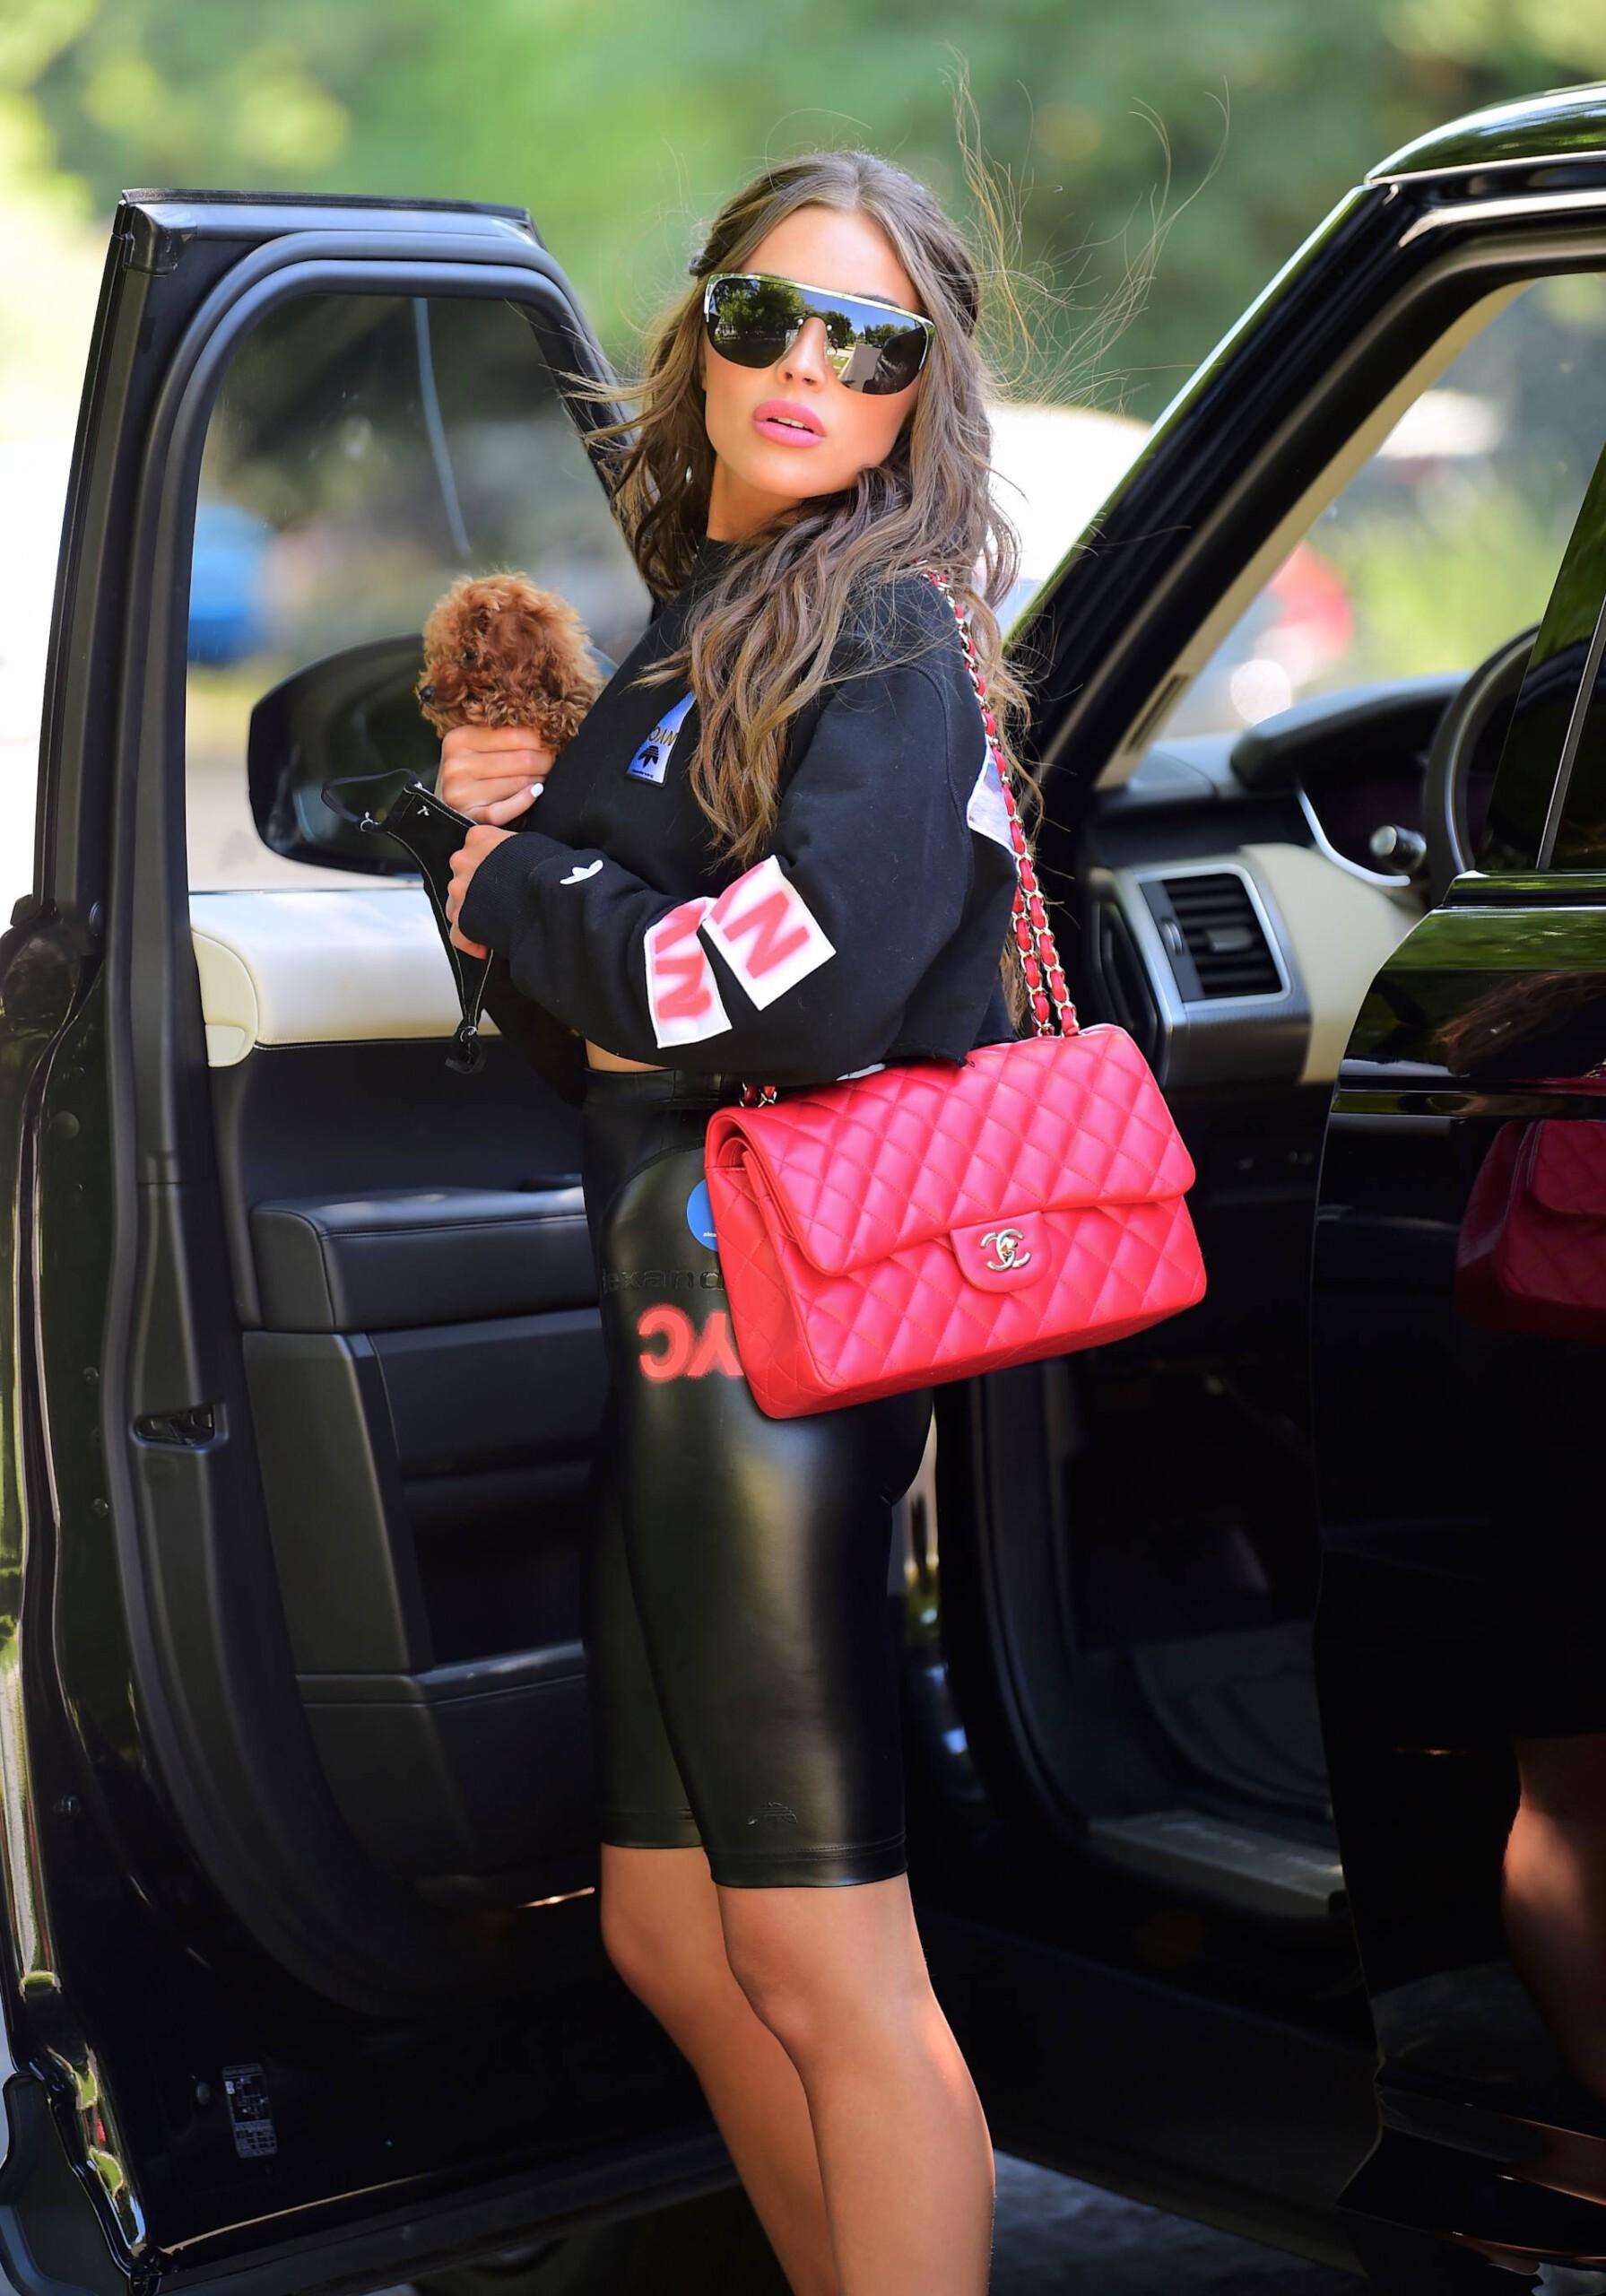 Olivia Culpo Beautiful In Spandex